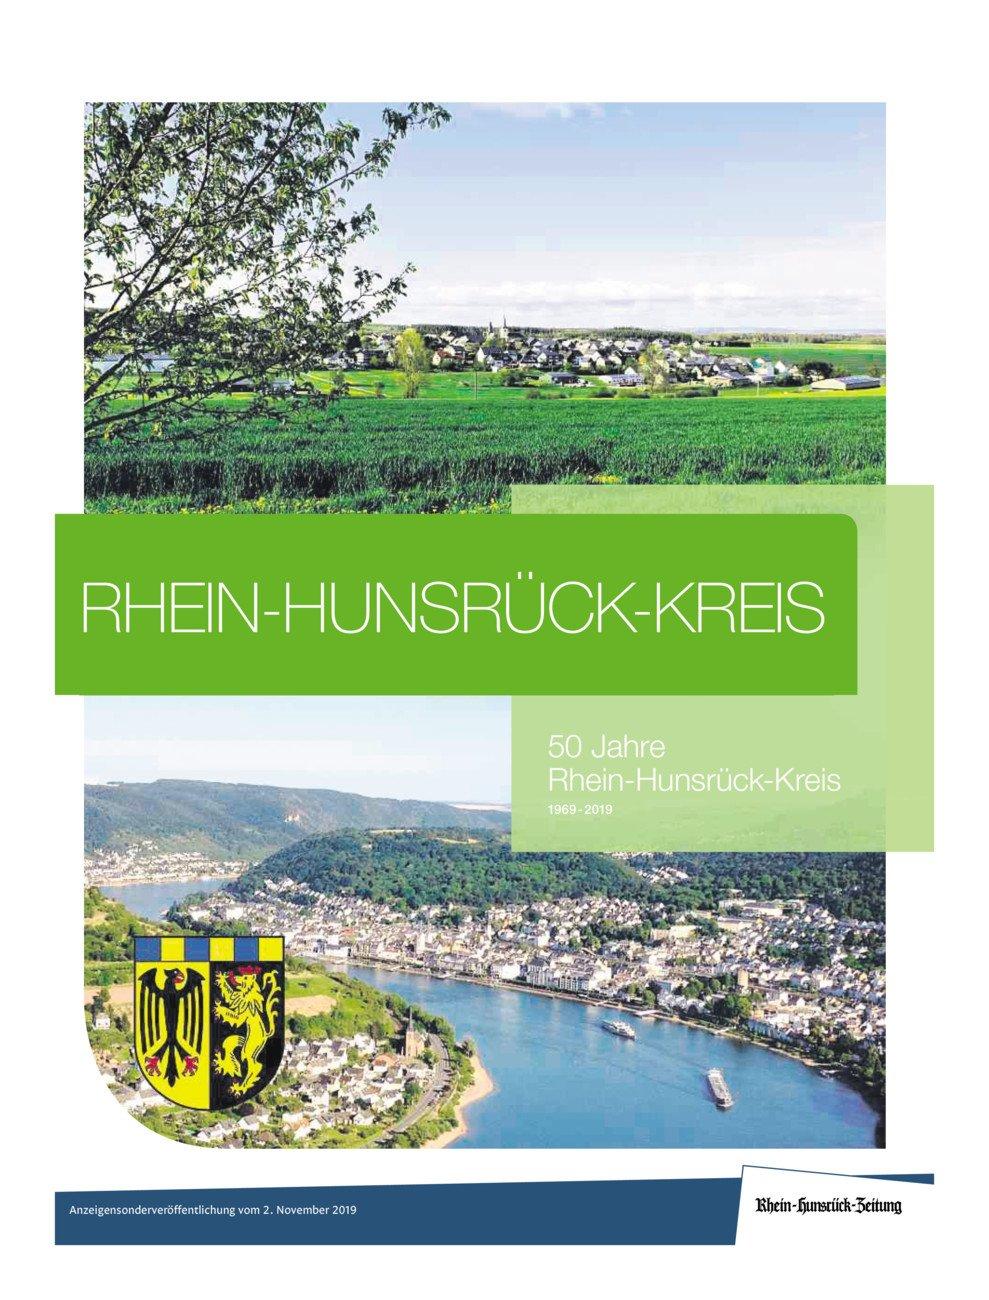 50 Jahre Rhein-Hunsrück-Kreis